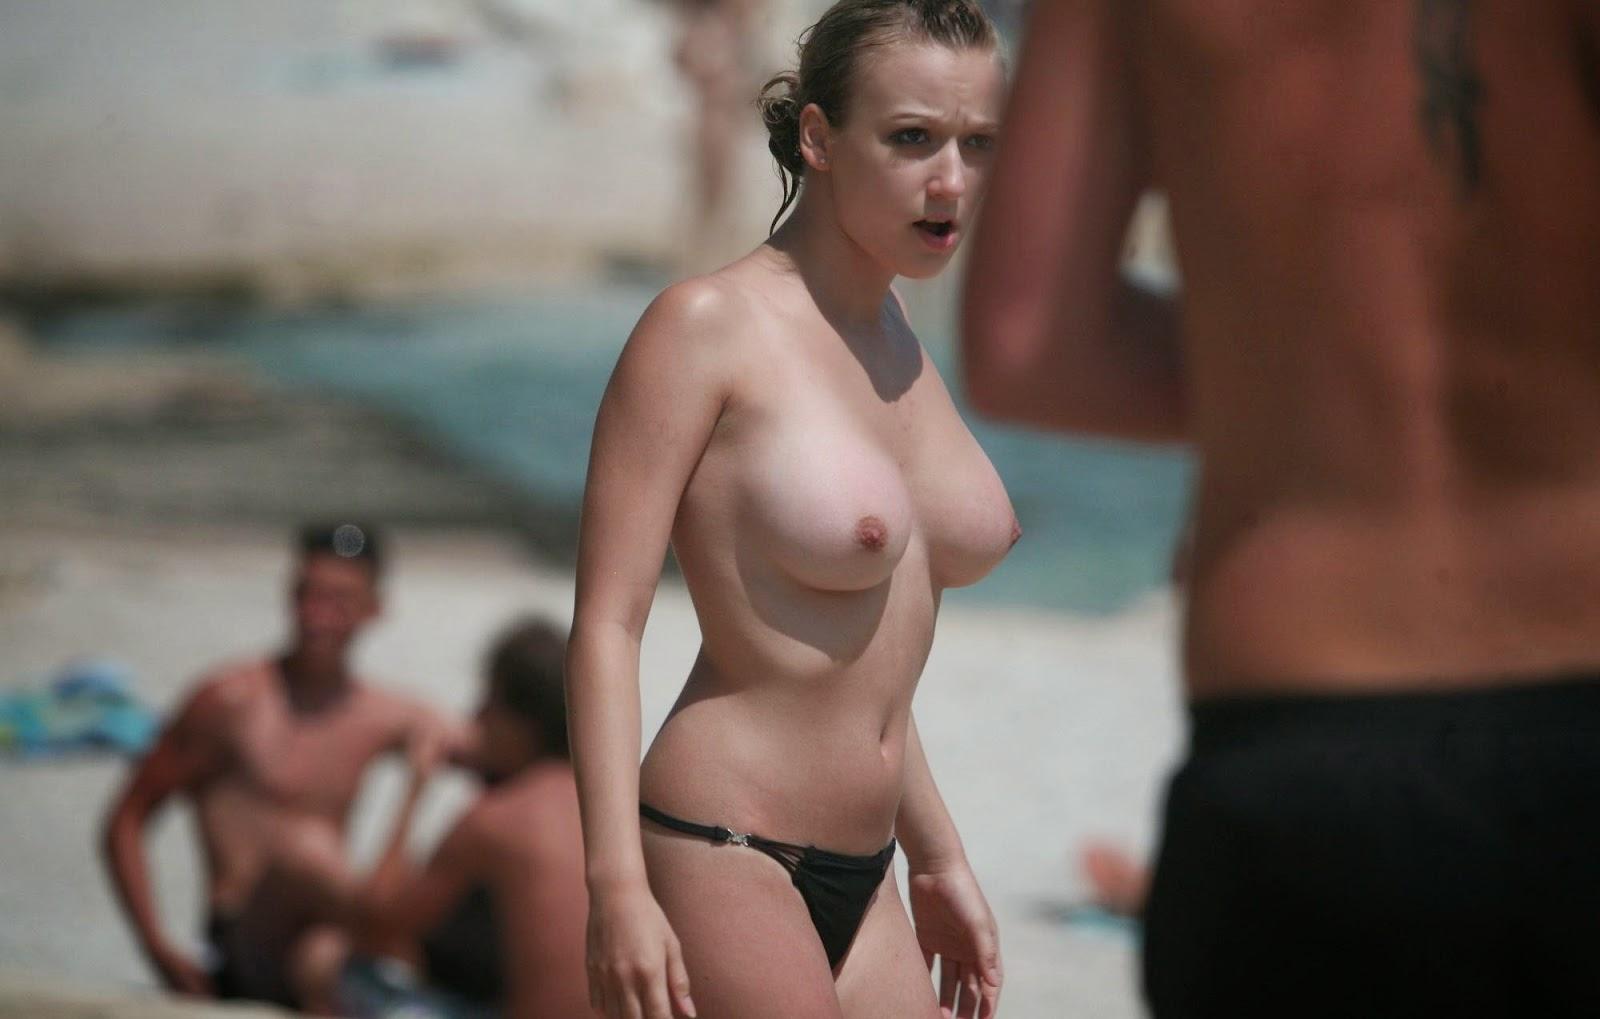 fucking naked bengali women photos